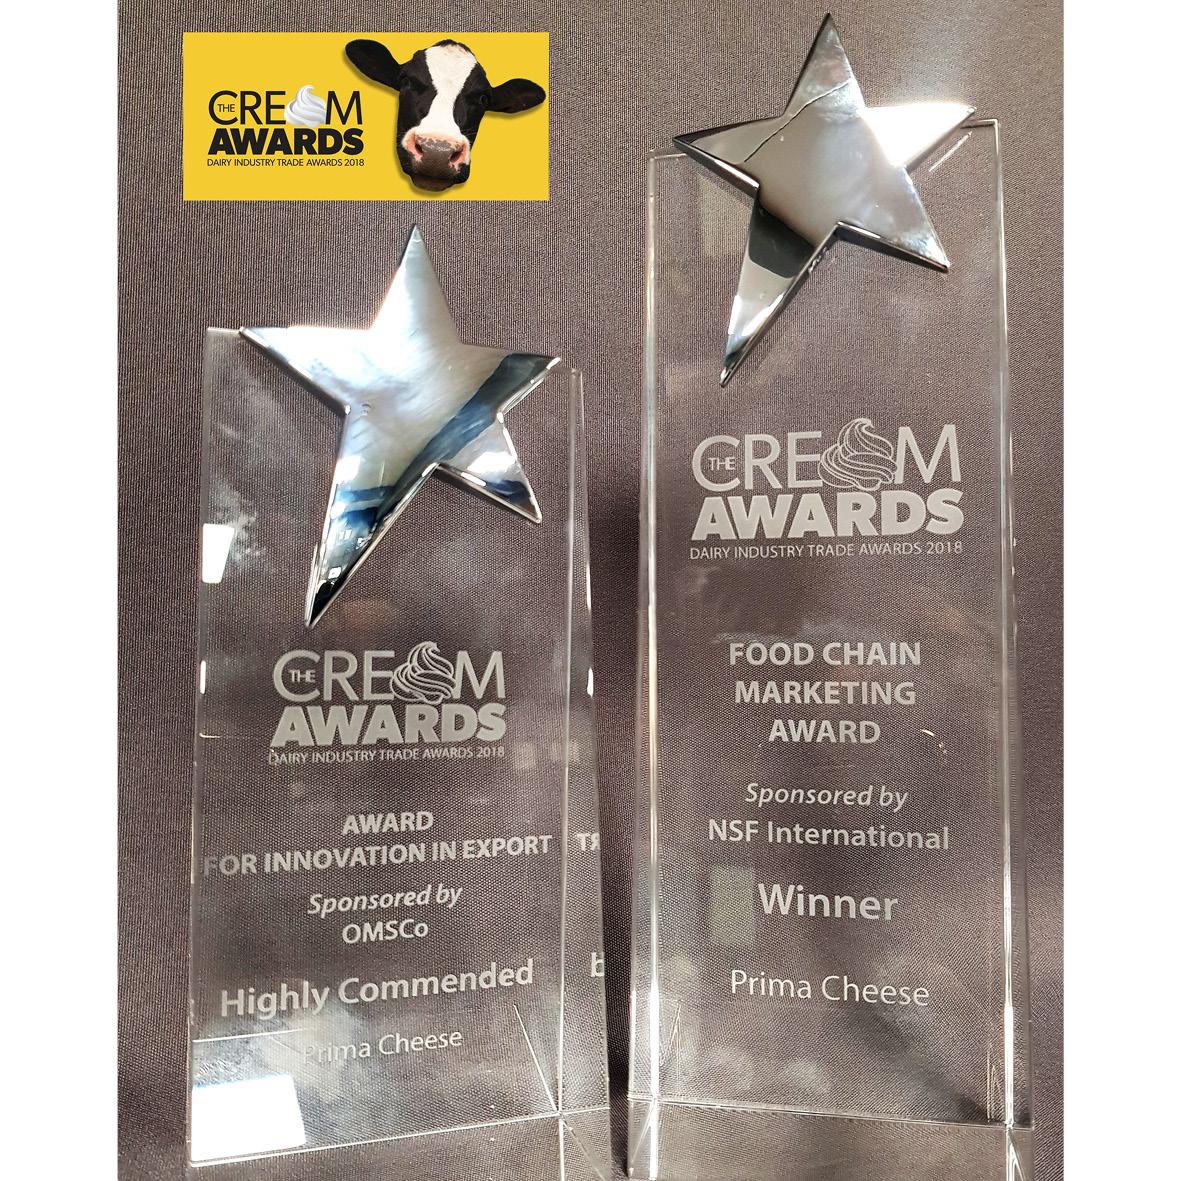 Prima Wins 2 Awards at The Cream Awards